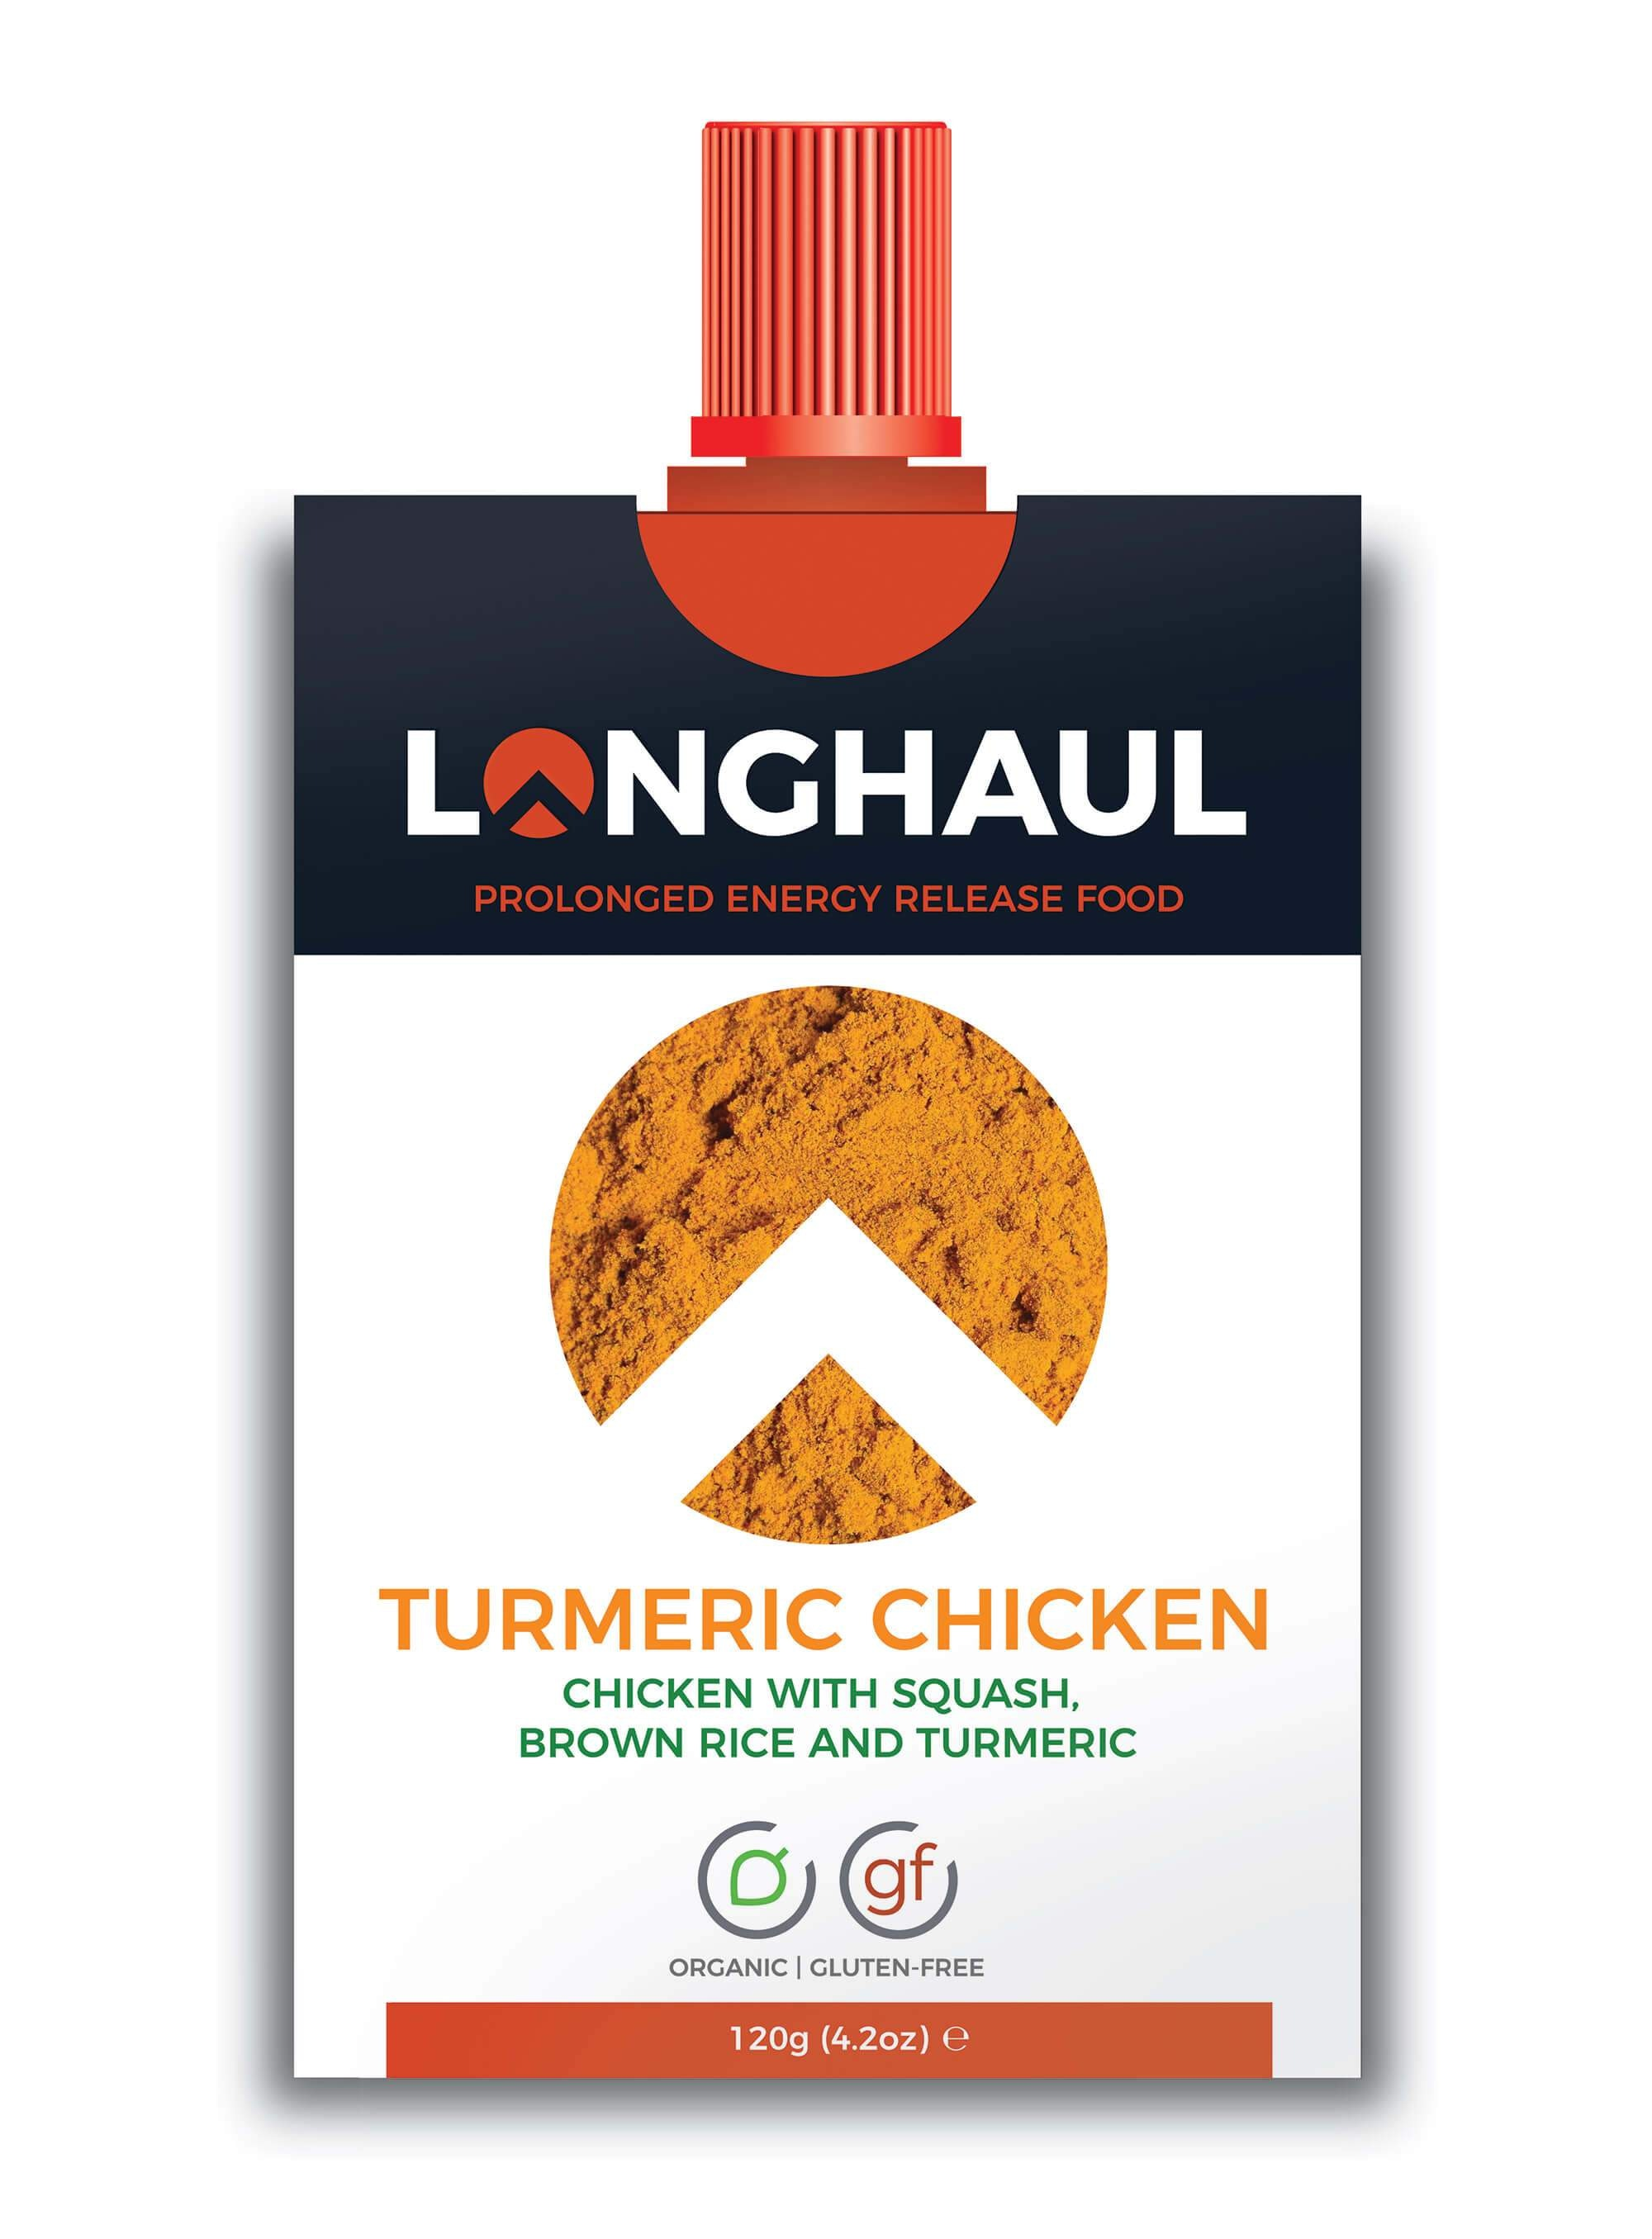 Longhaul Tumeric Chicken sweepstakes